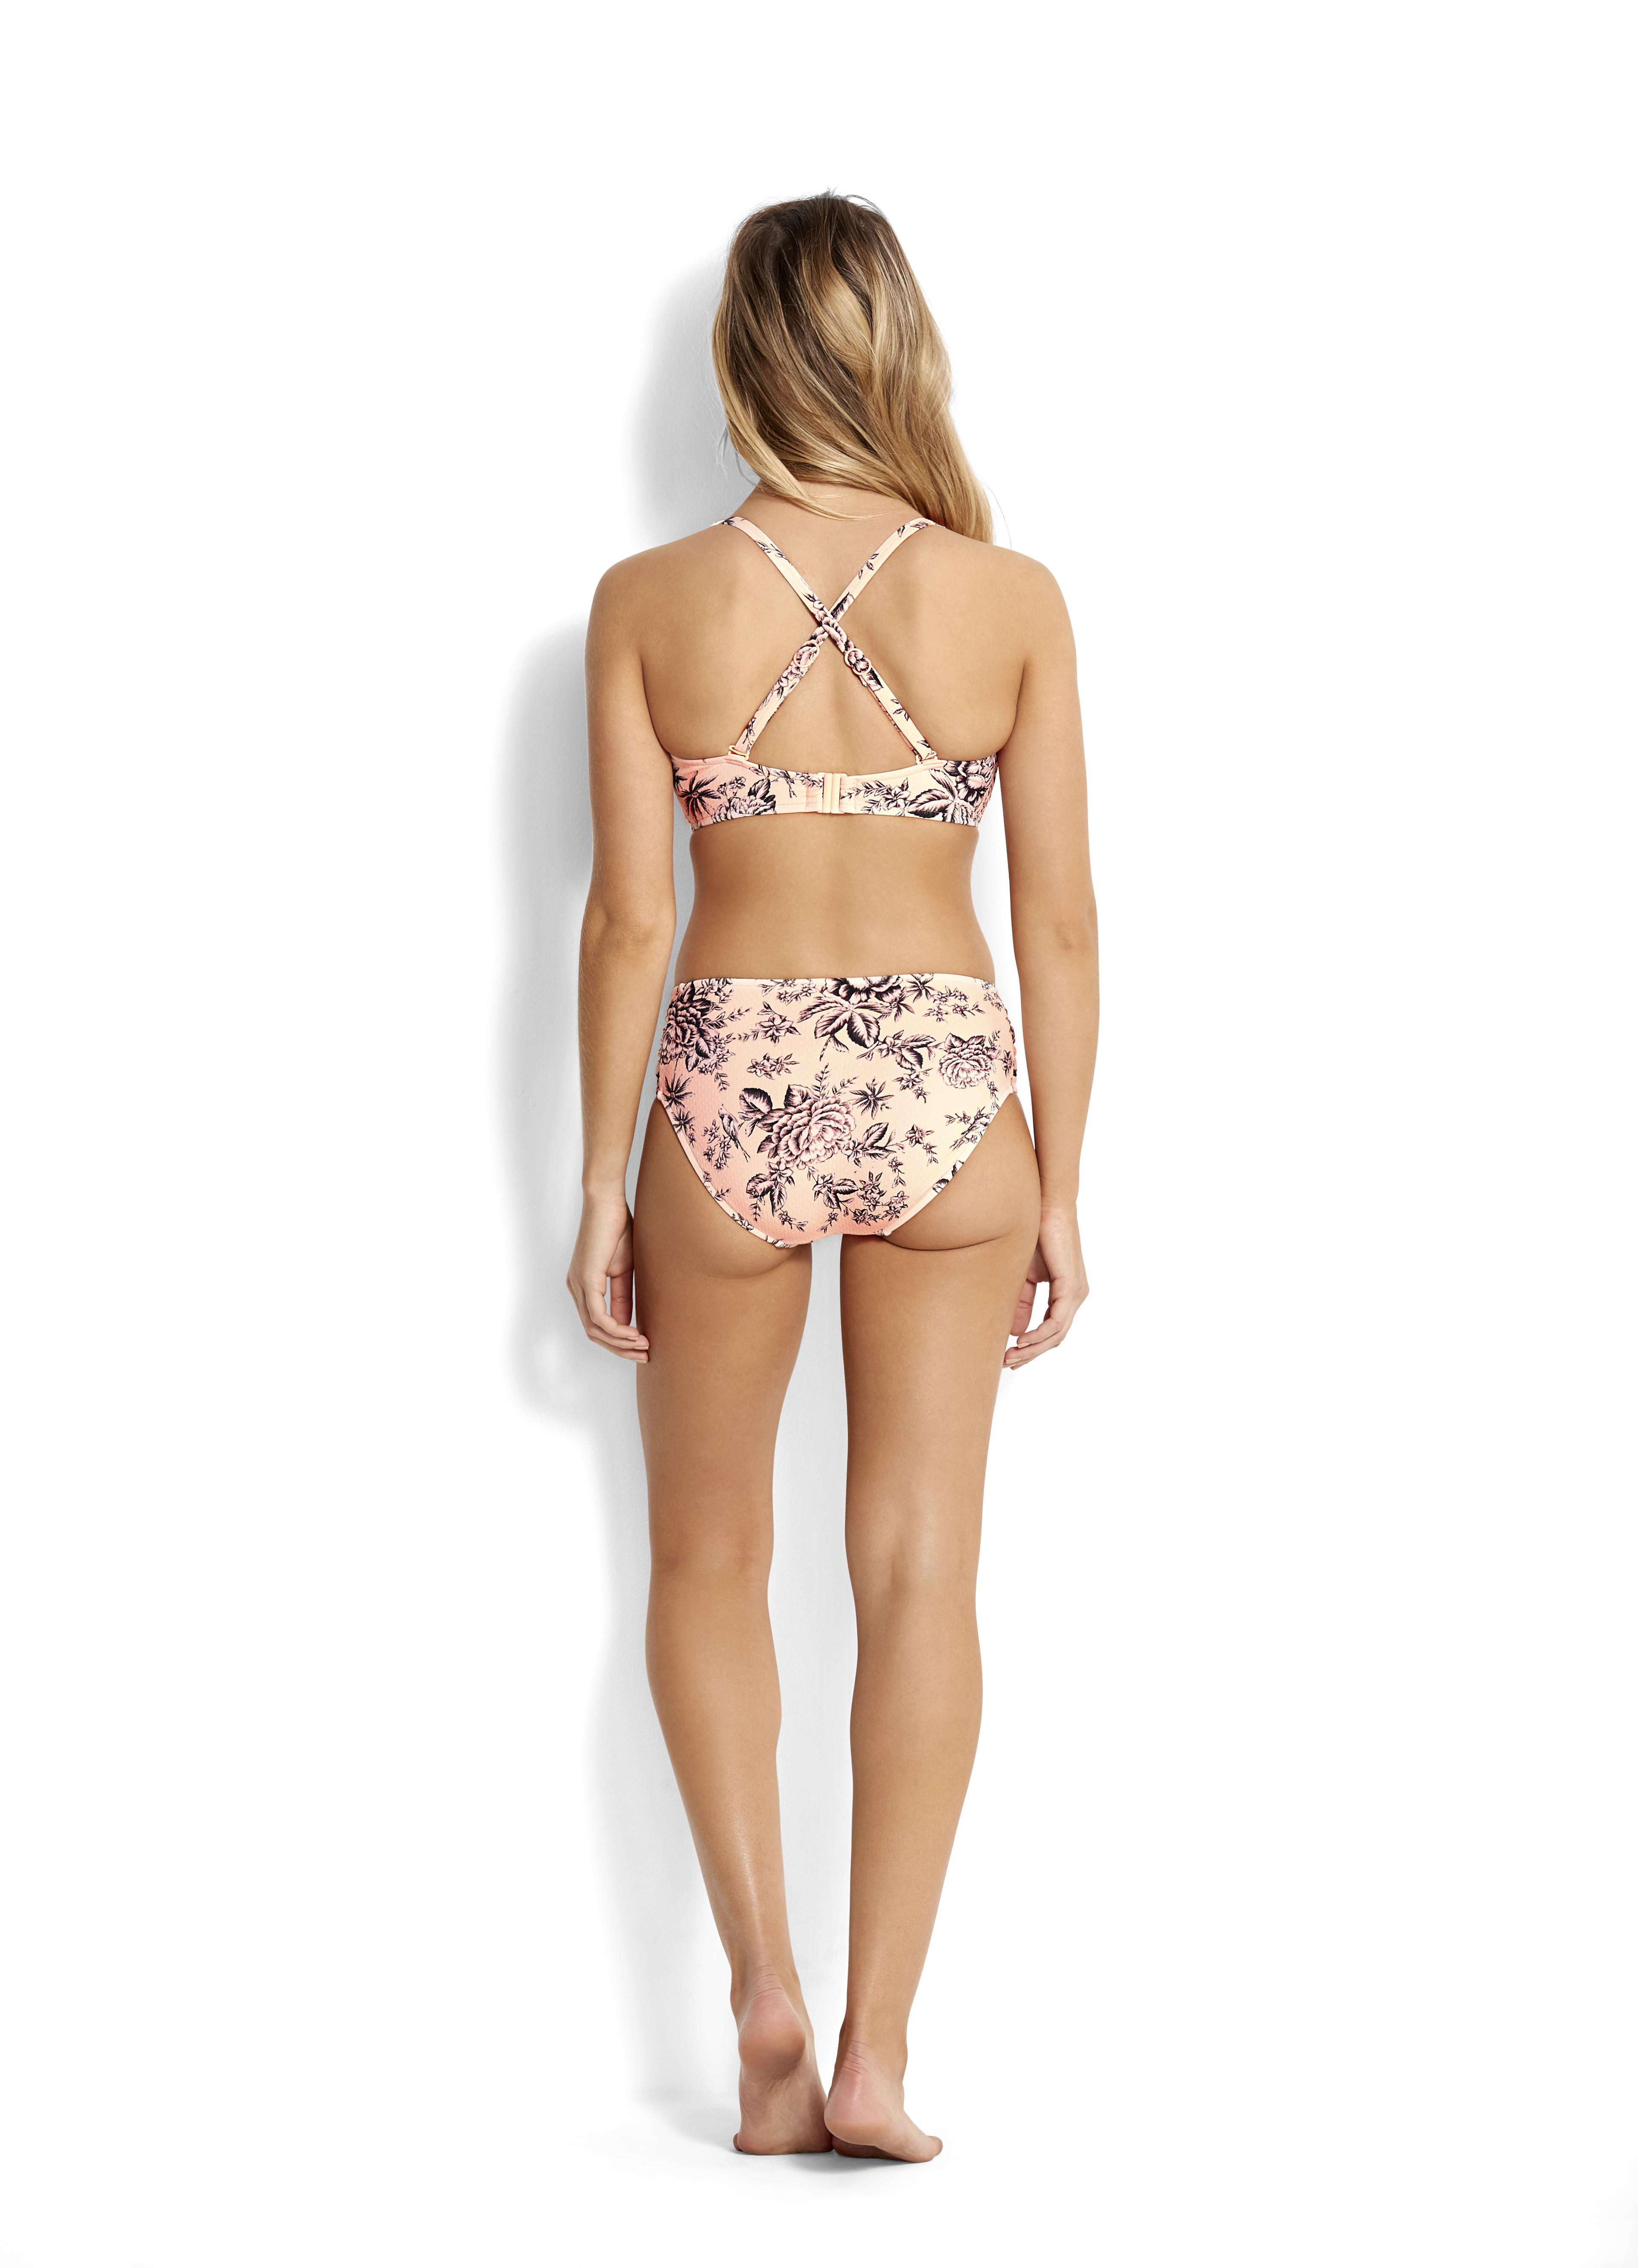 f296a3c643 Seafolly Love Bird F Cup Halter Bikini Top - Peach